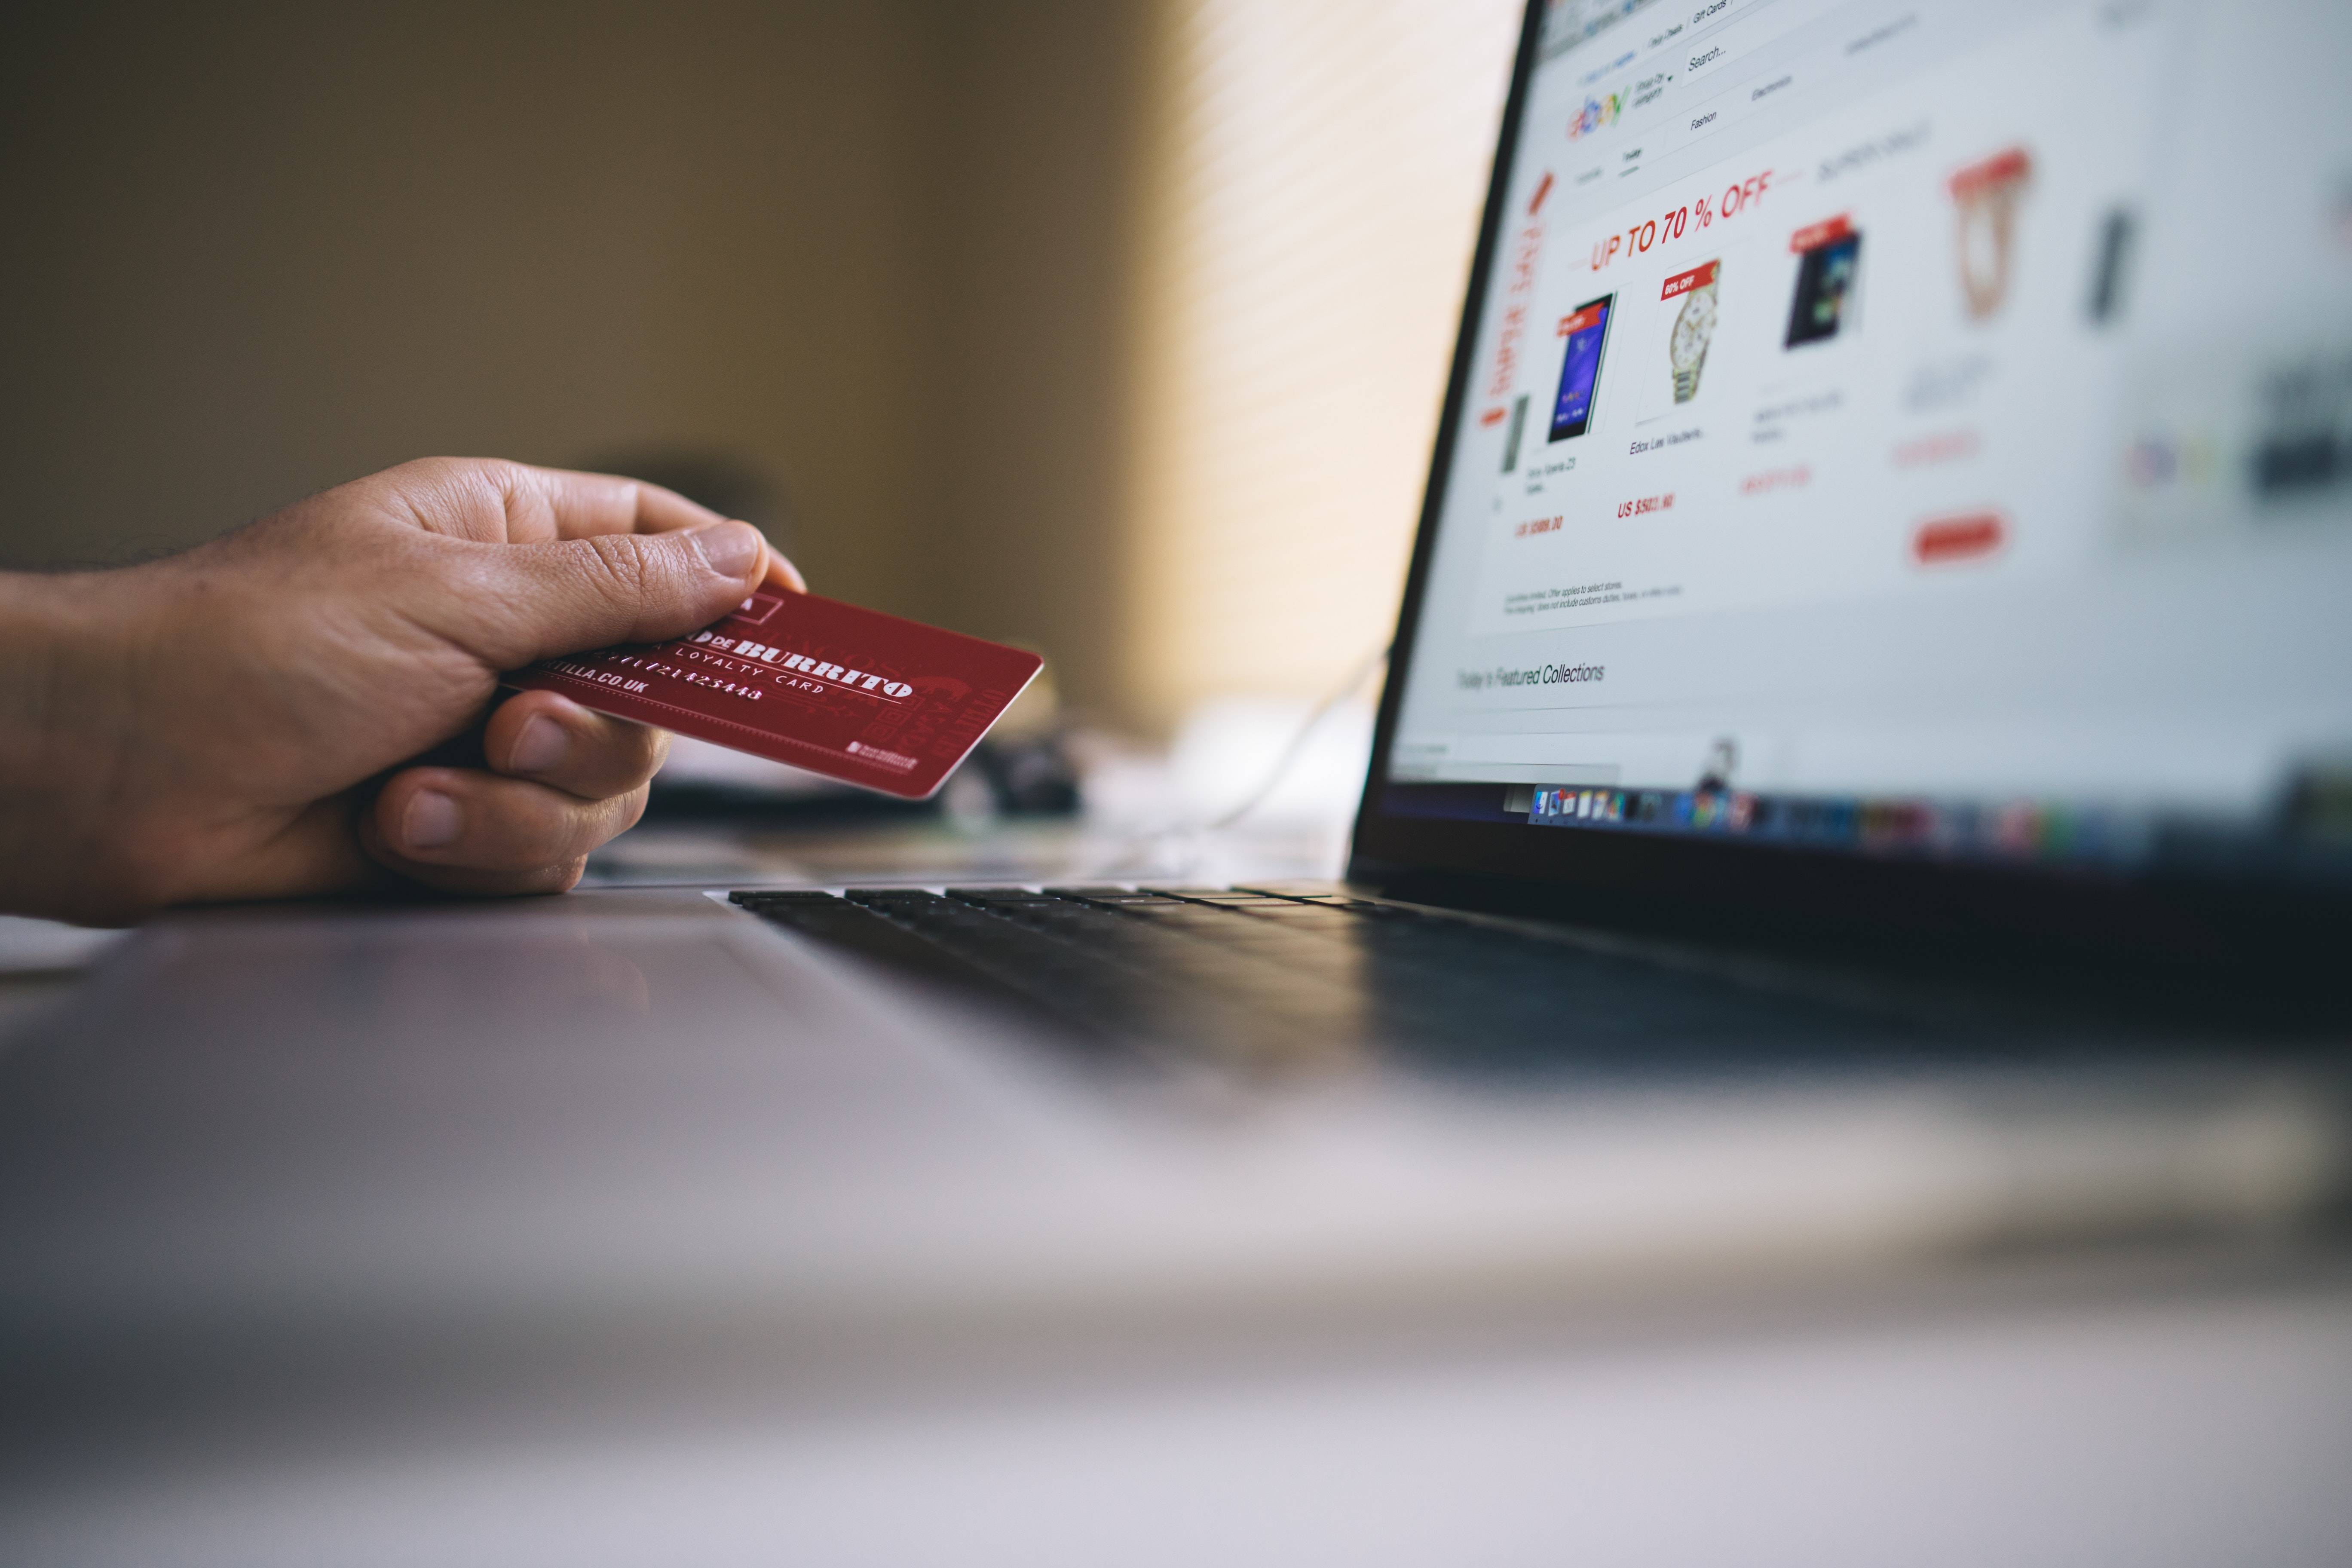 Cae red que usaba tarjetas de crédito hackeadas para entrada ilegal de colombianos a España